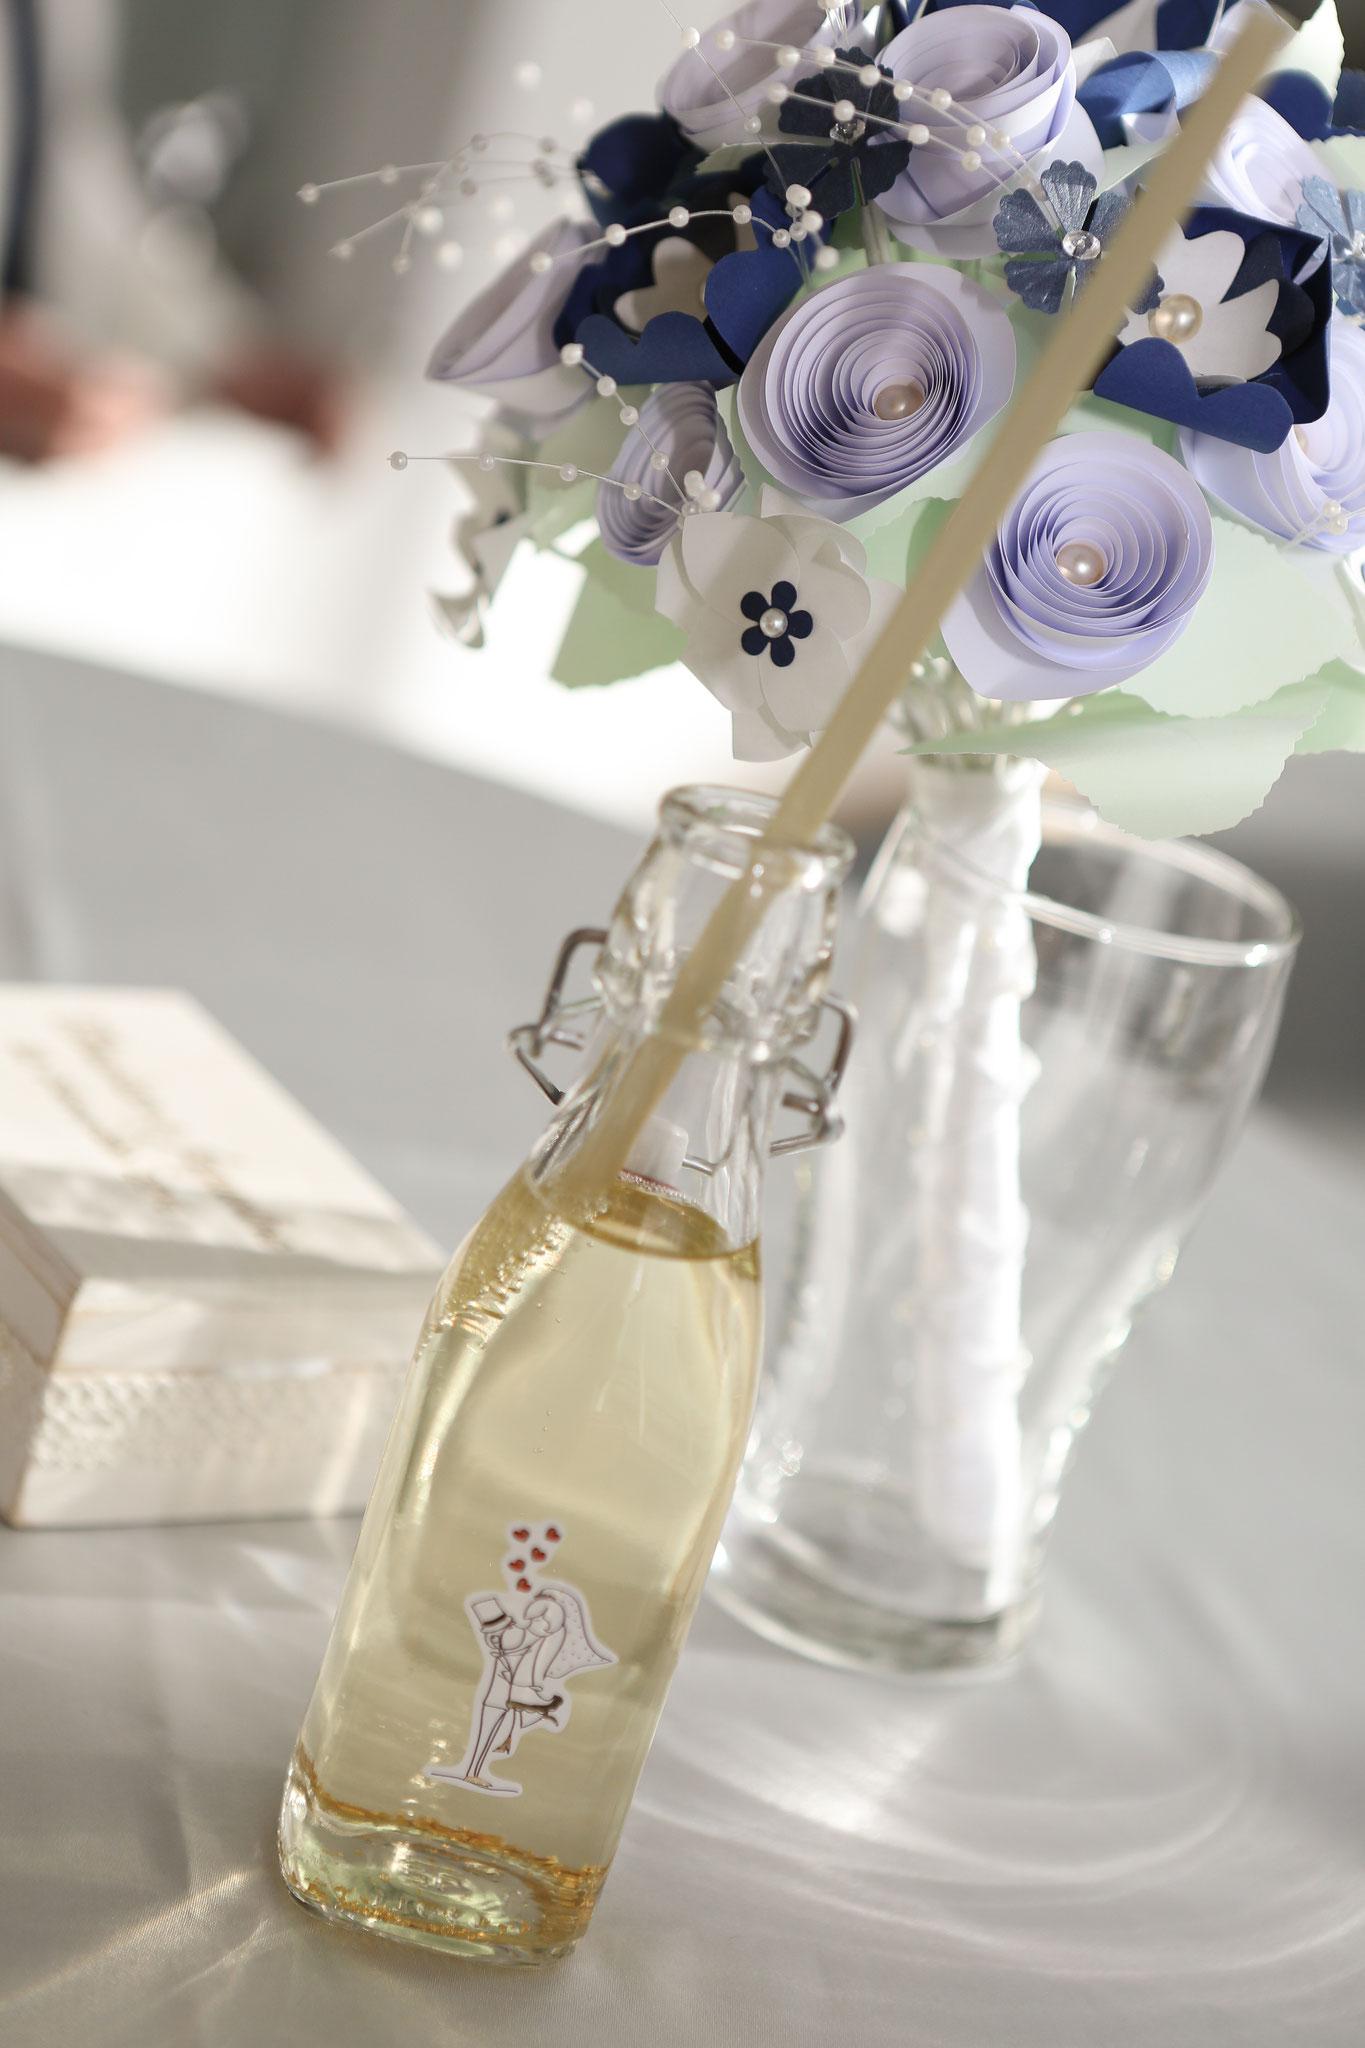 www.lovelyflowers.de - Dein Spezialist für zauberhafte PAPER-ART Brautsträuße!